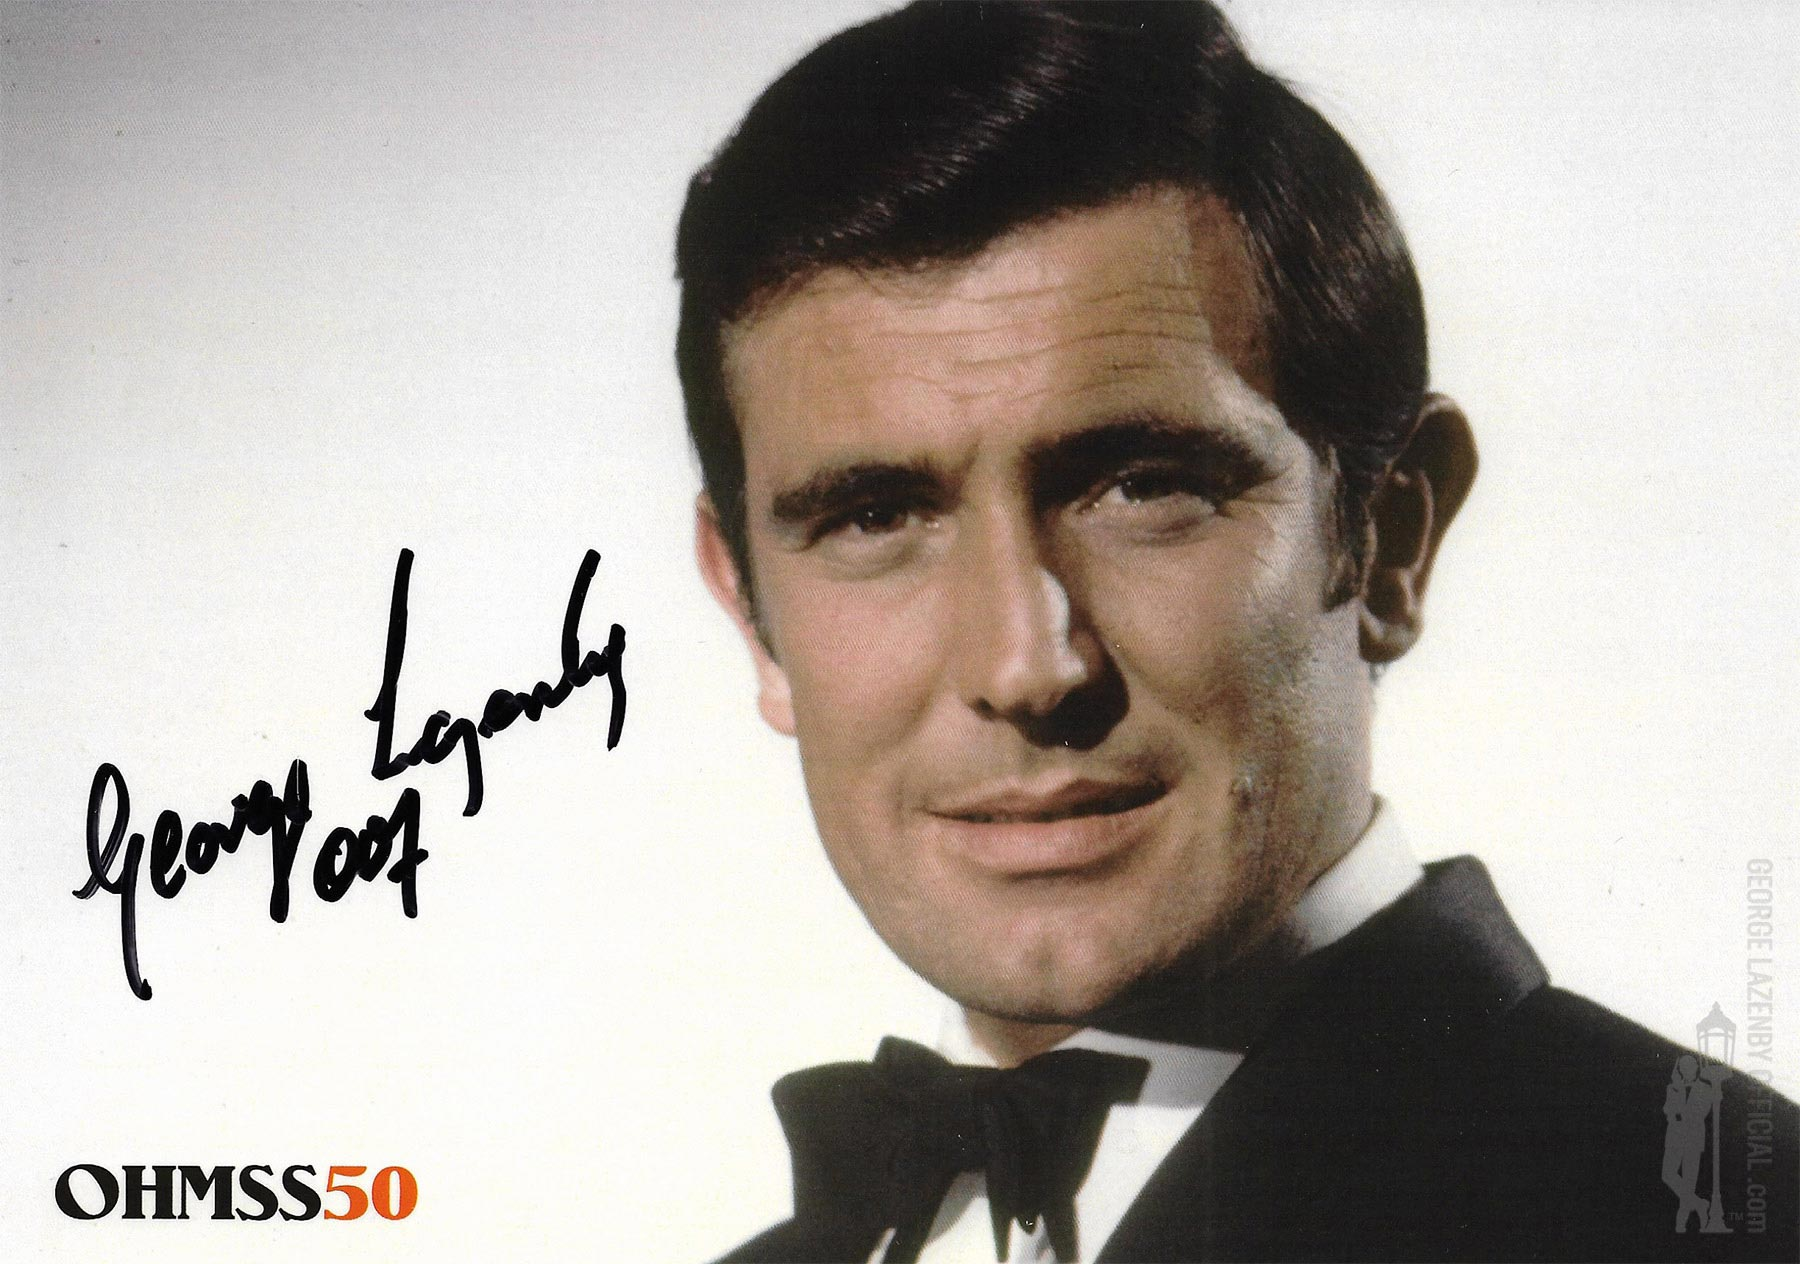 OHMSS 50 George Lazenby signed photograph GLOHMSS50-03